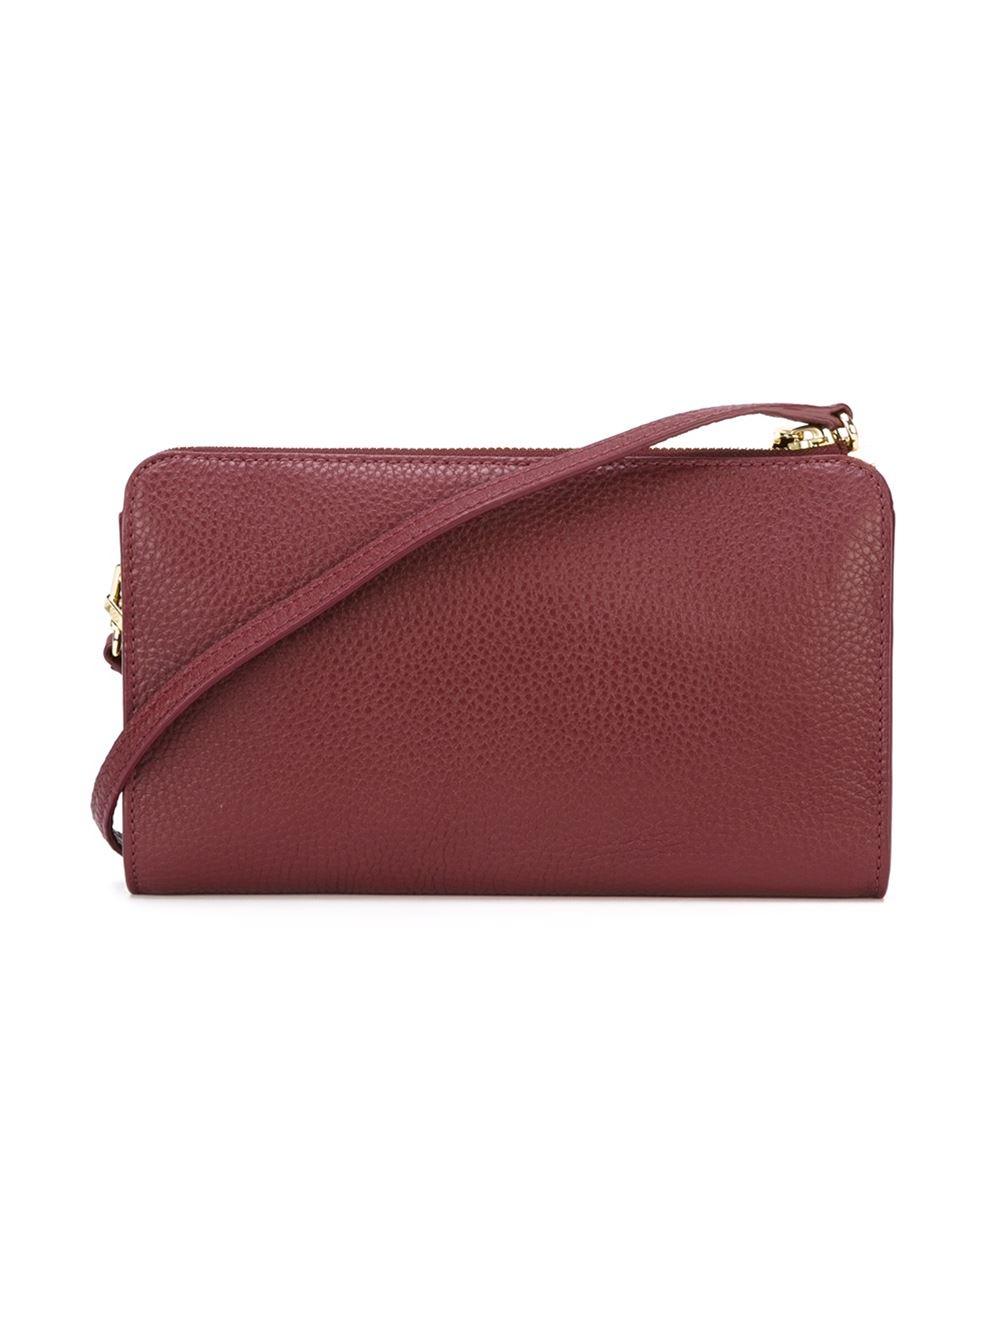 tory burch robinson wallet crossbody bag in red lyst